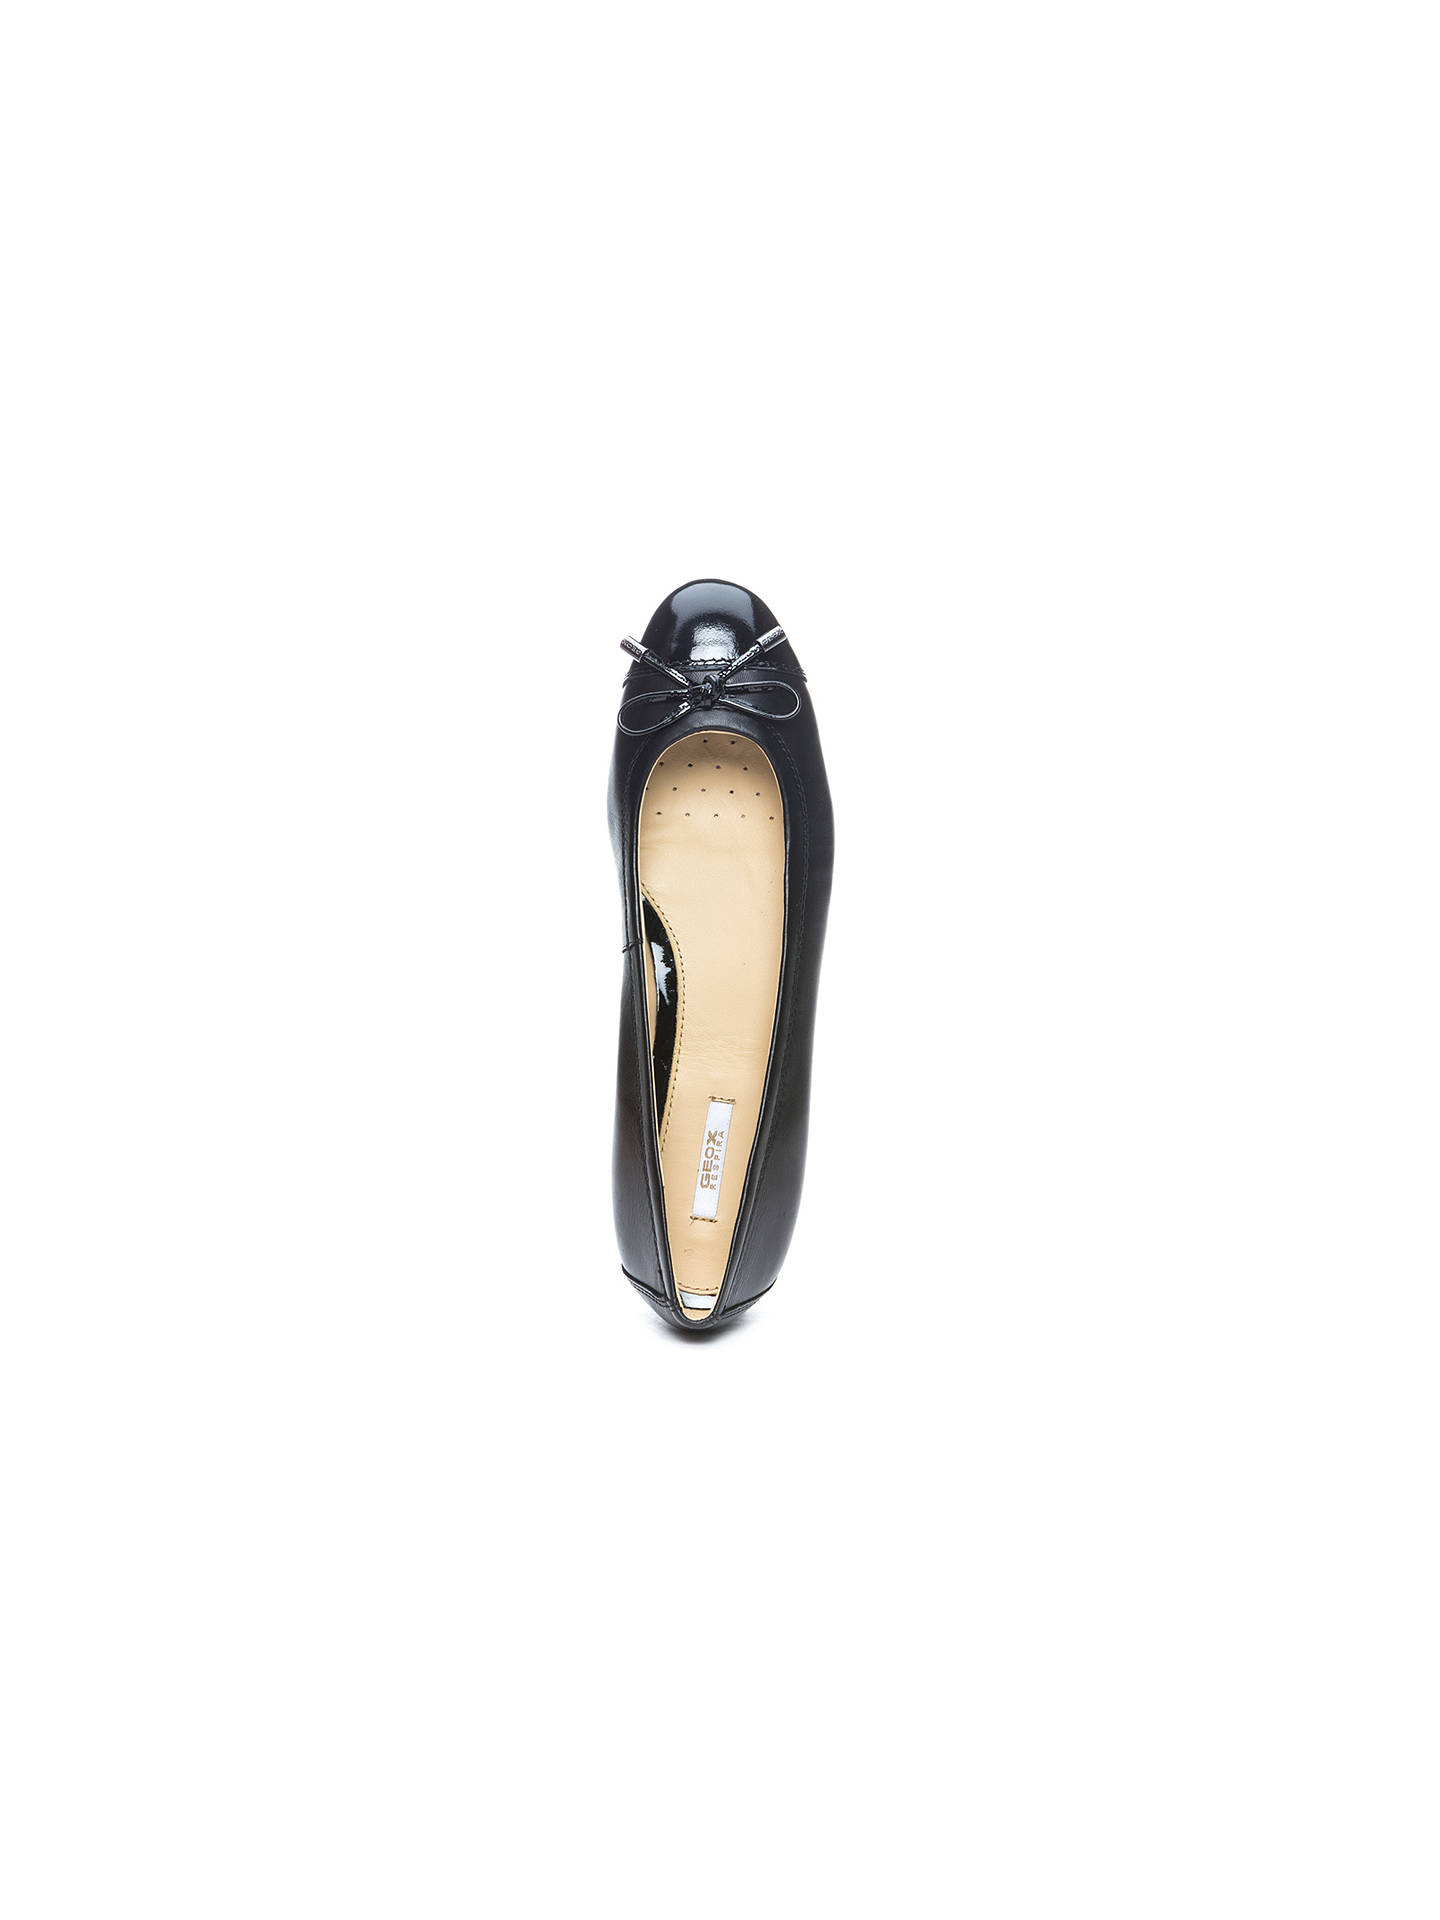 fbfa02602cc4 ... Buy Geox Women s Lola Flat Bow Detail Ballet Pumps